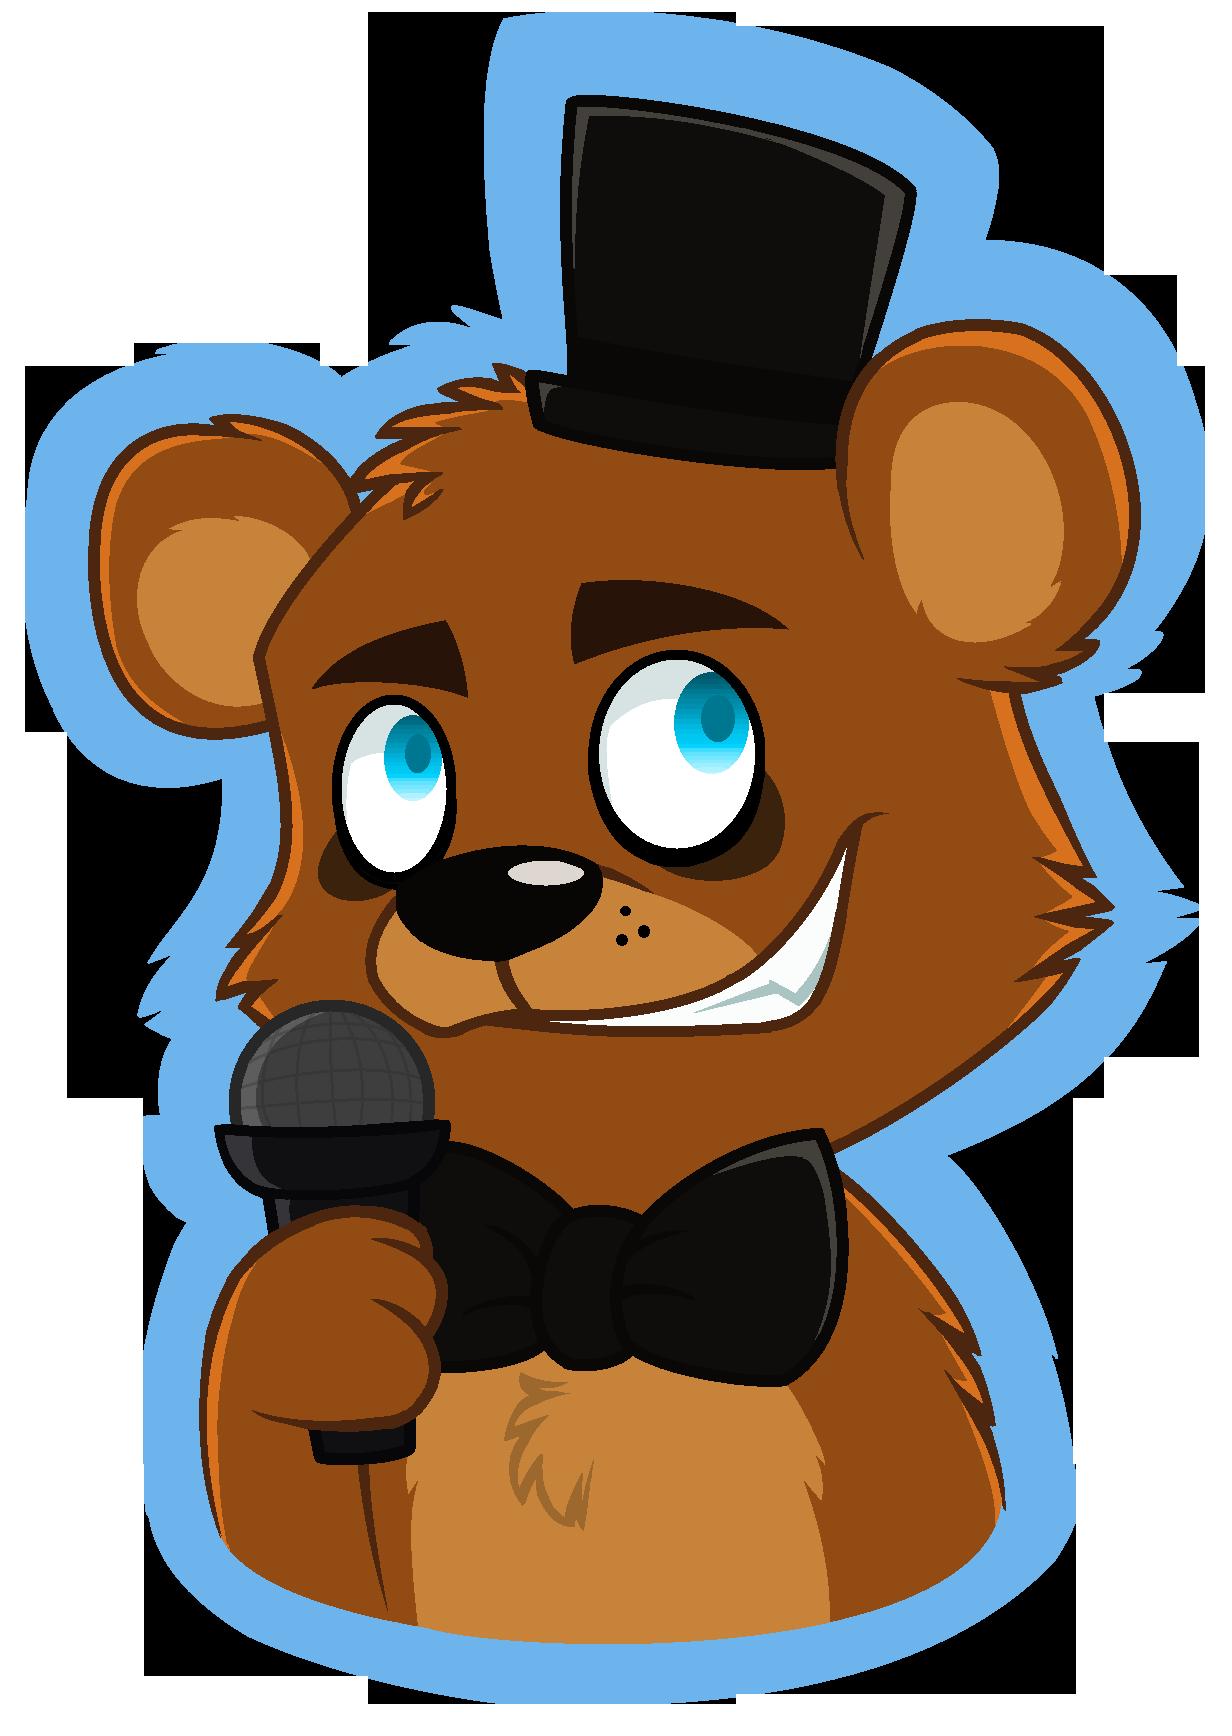 Freddy Fazbear by PyroLikesTacos on DeviantArt